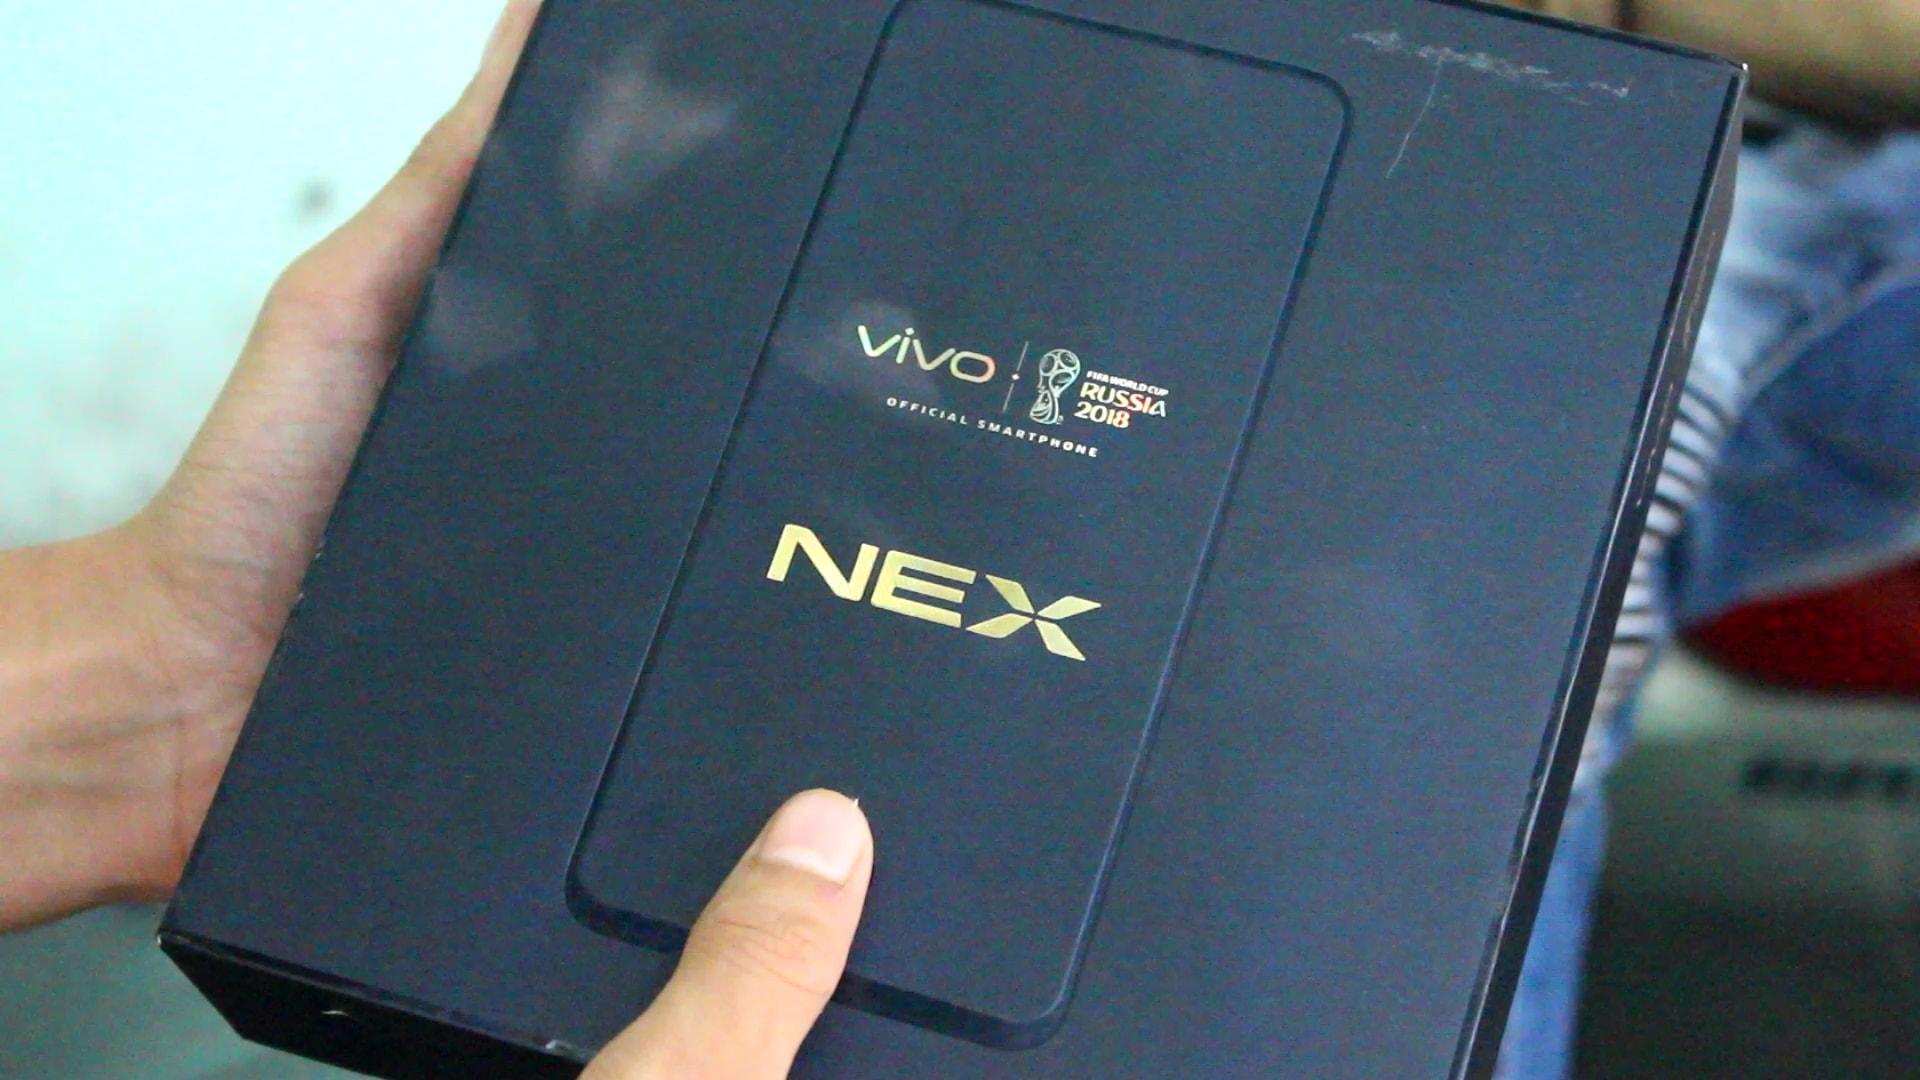 Vivo NEX Box